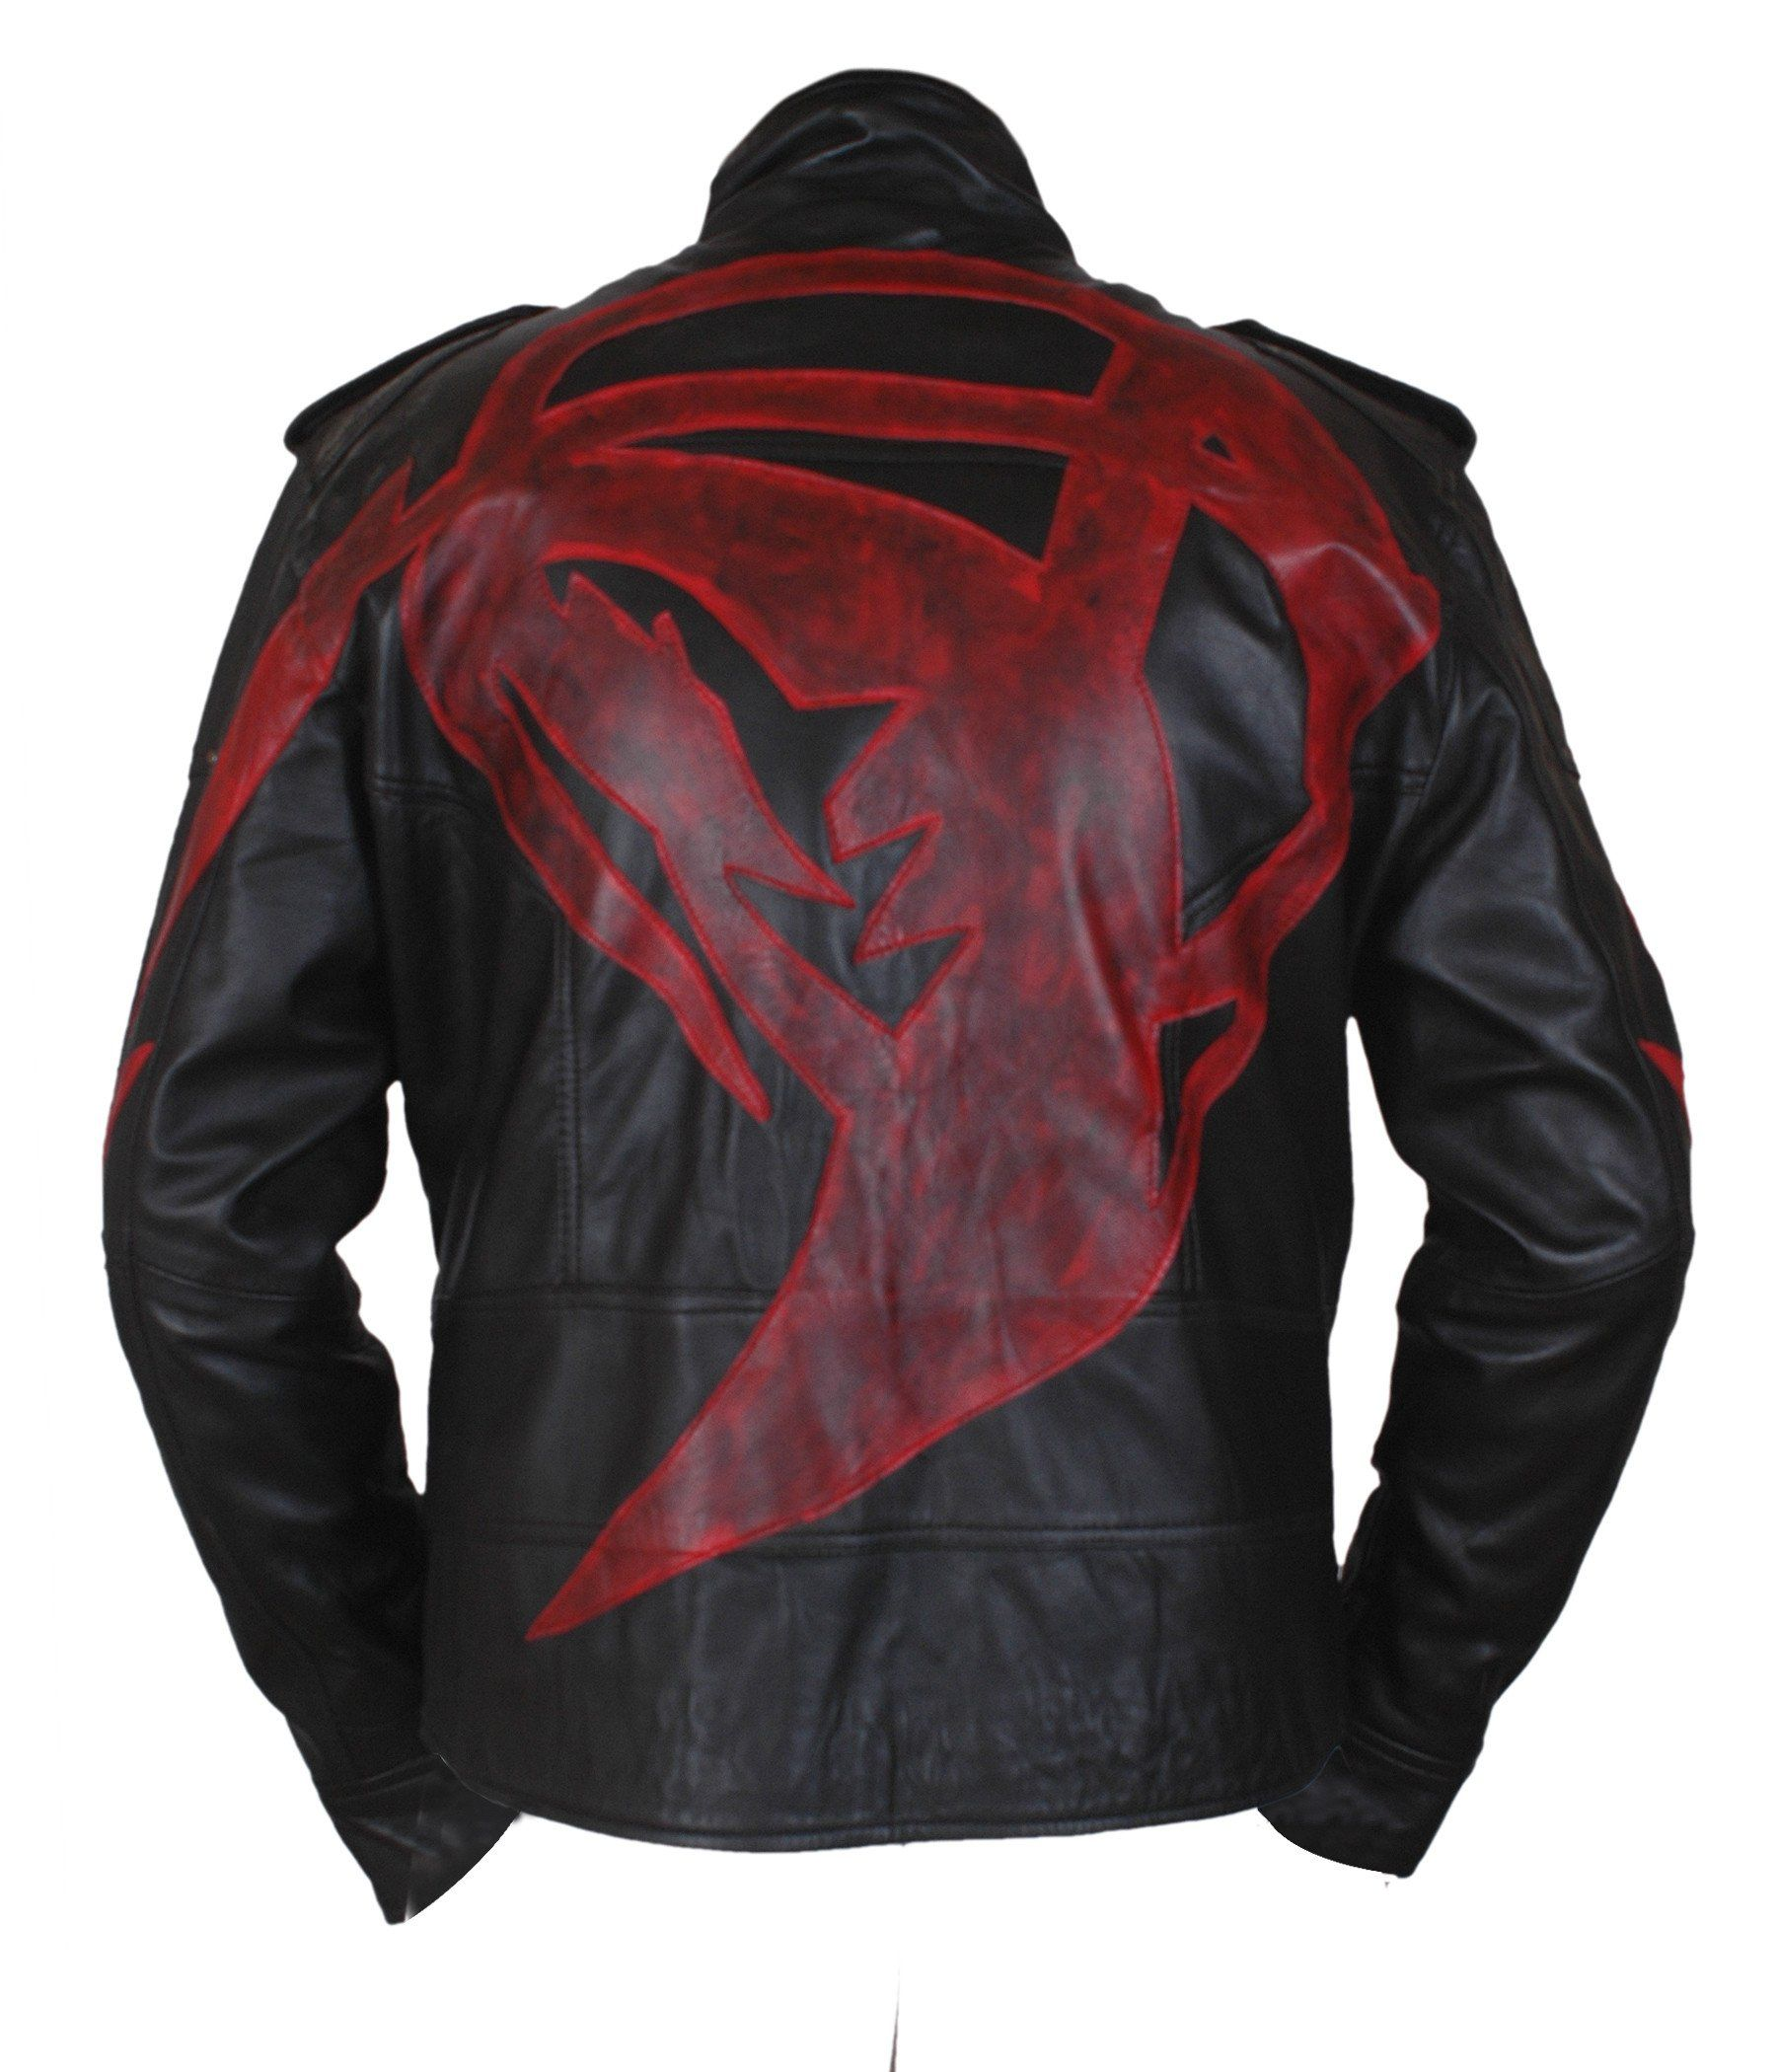 F H Boy S Prototype 2 James Heller Alex Mercer Genuine Leather Jacket Xs Black Premium Quality Medium Weight Co Jackets Leather Jacket Genuine Leather Jackets